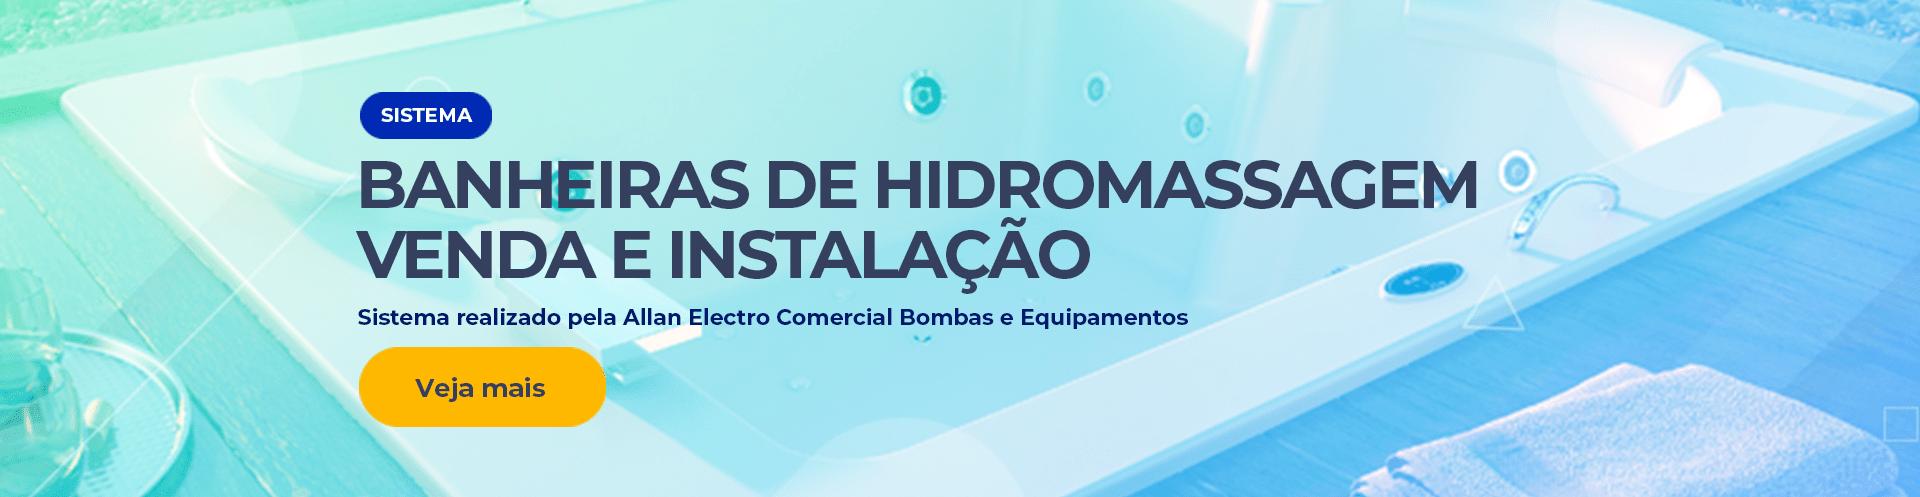 TODA BANHEIRA DE HIDROMASSAGEM TEM ALLAN ELECTRO